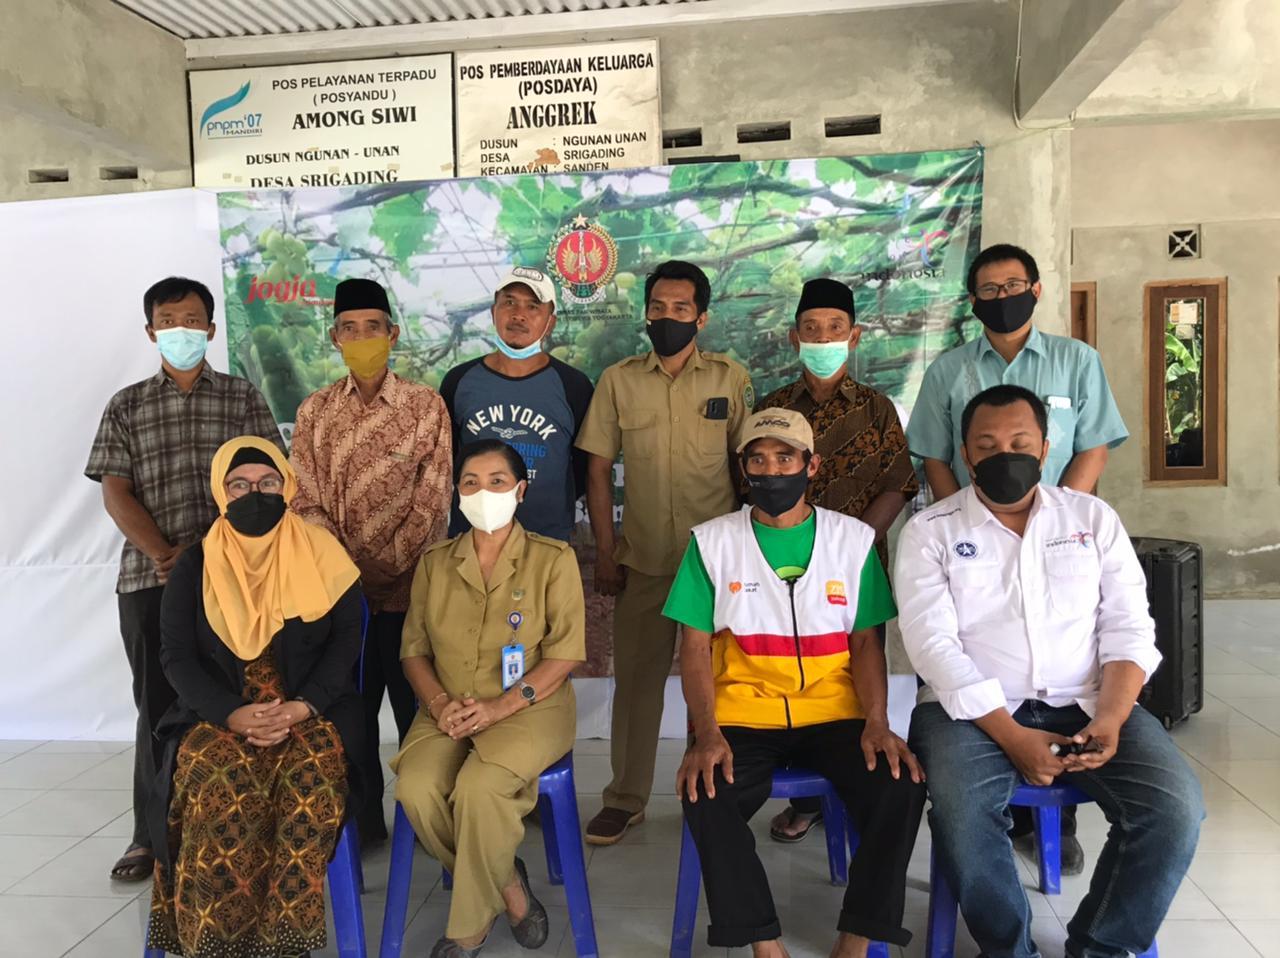 Dosen FEB-UAD melakukan pendampingan pembentukan Kawasan Eko Edu Wisata di Dusun Ngunan Unan, Desa Srigading, Kecamatan Sanden, Kabupaten Bantul.